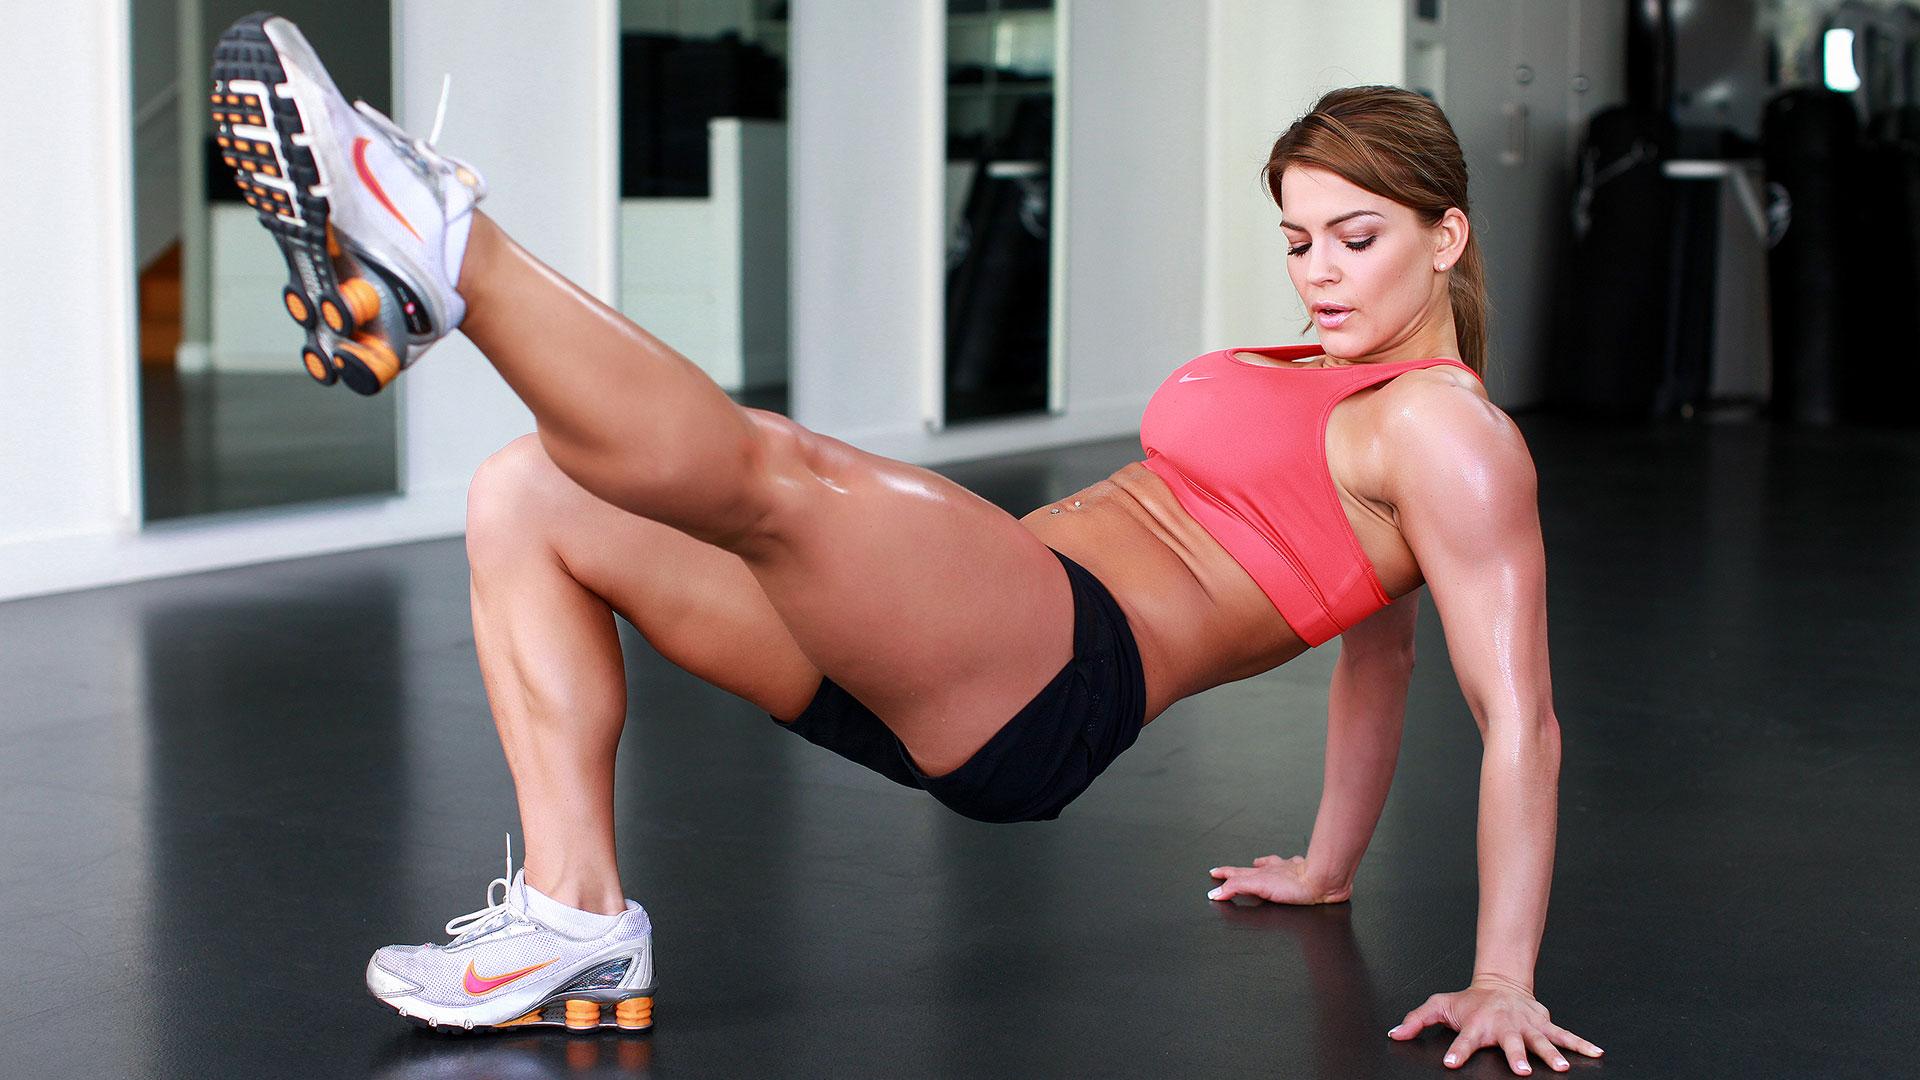 Audrey bitoni gym sex